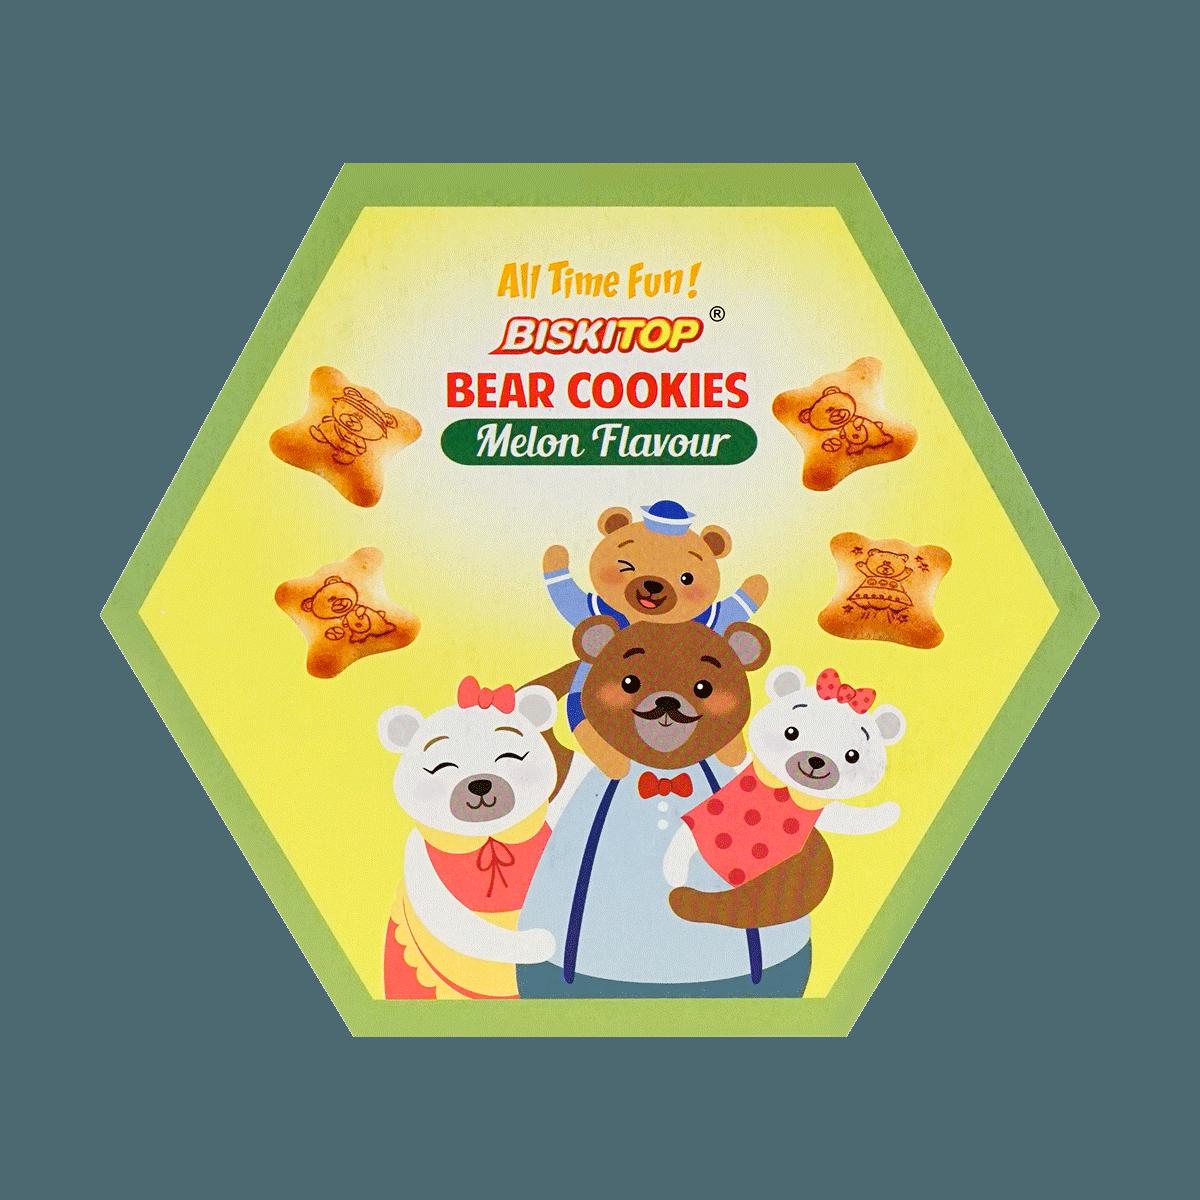 Yamibuy.com:Customer reviews:BISKITOP Bear Cookies Melon Flavor 5pk